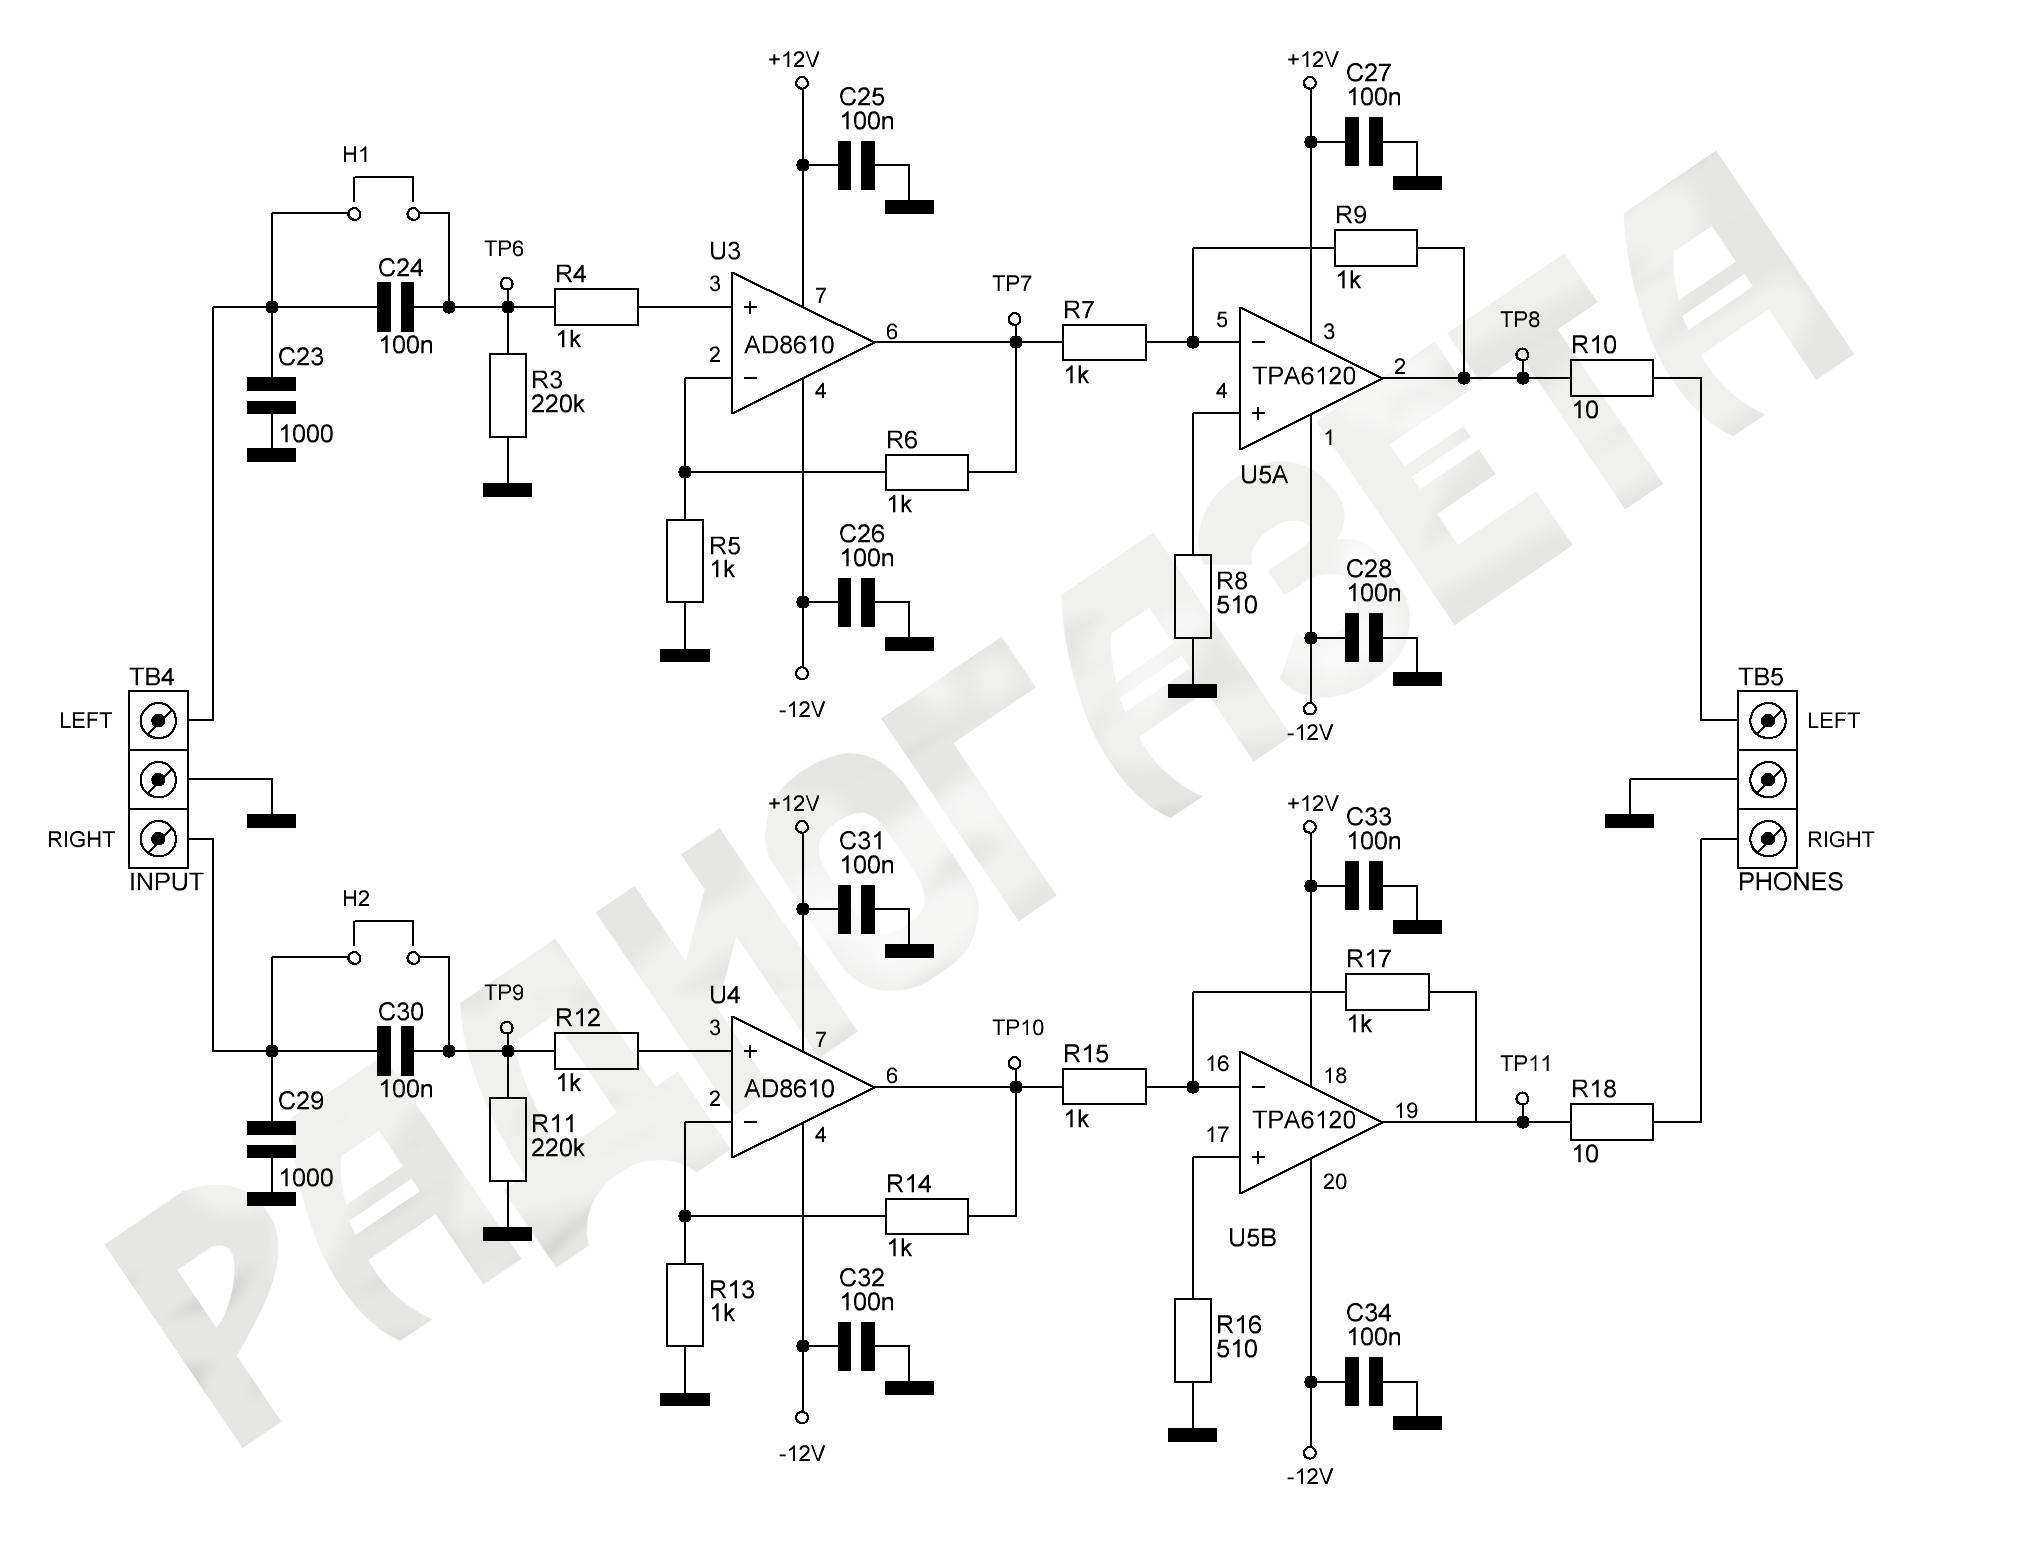 Самара схема движения маршруток фото 302